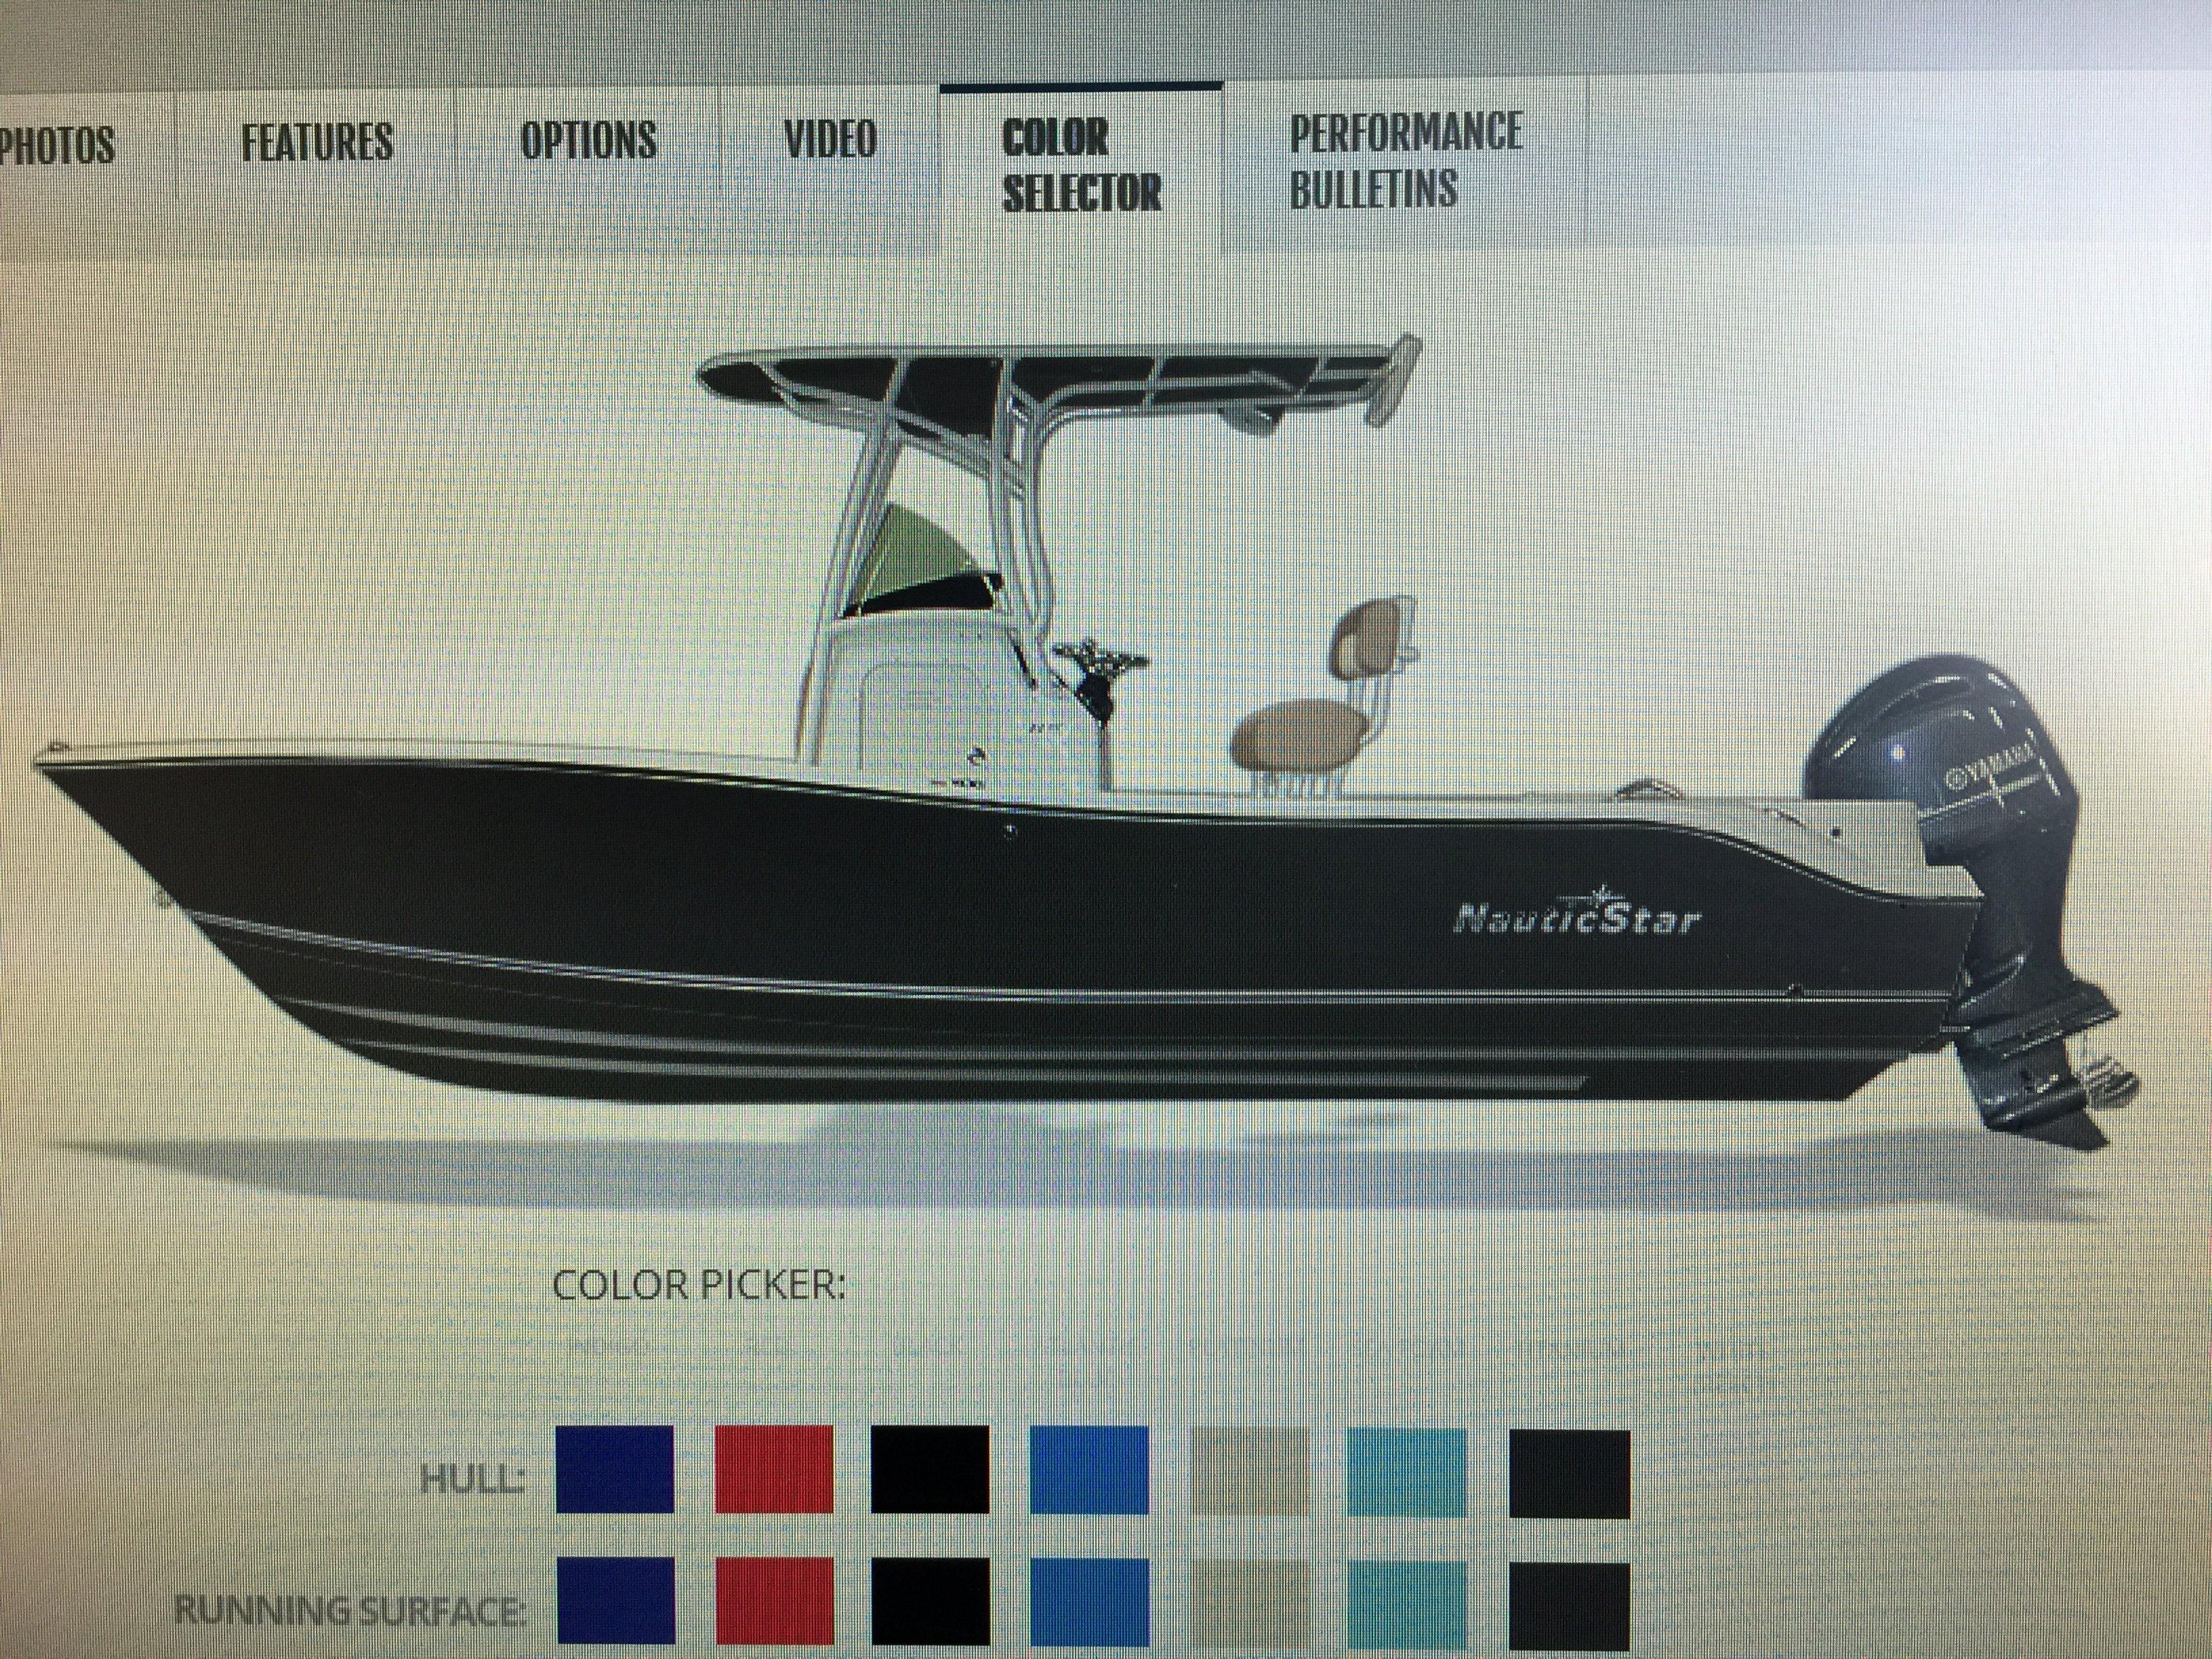 NauticStar22XS Offshore